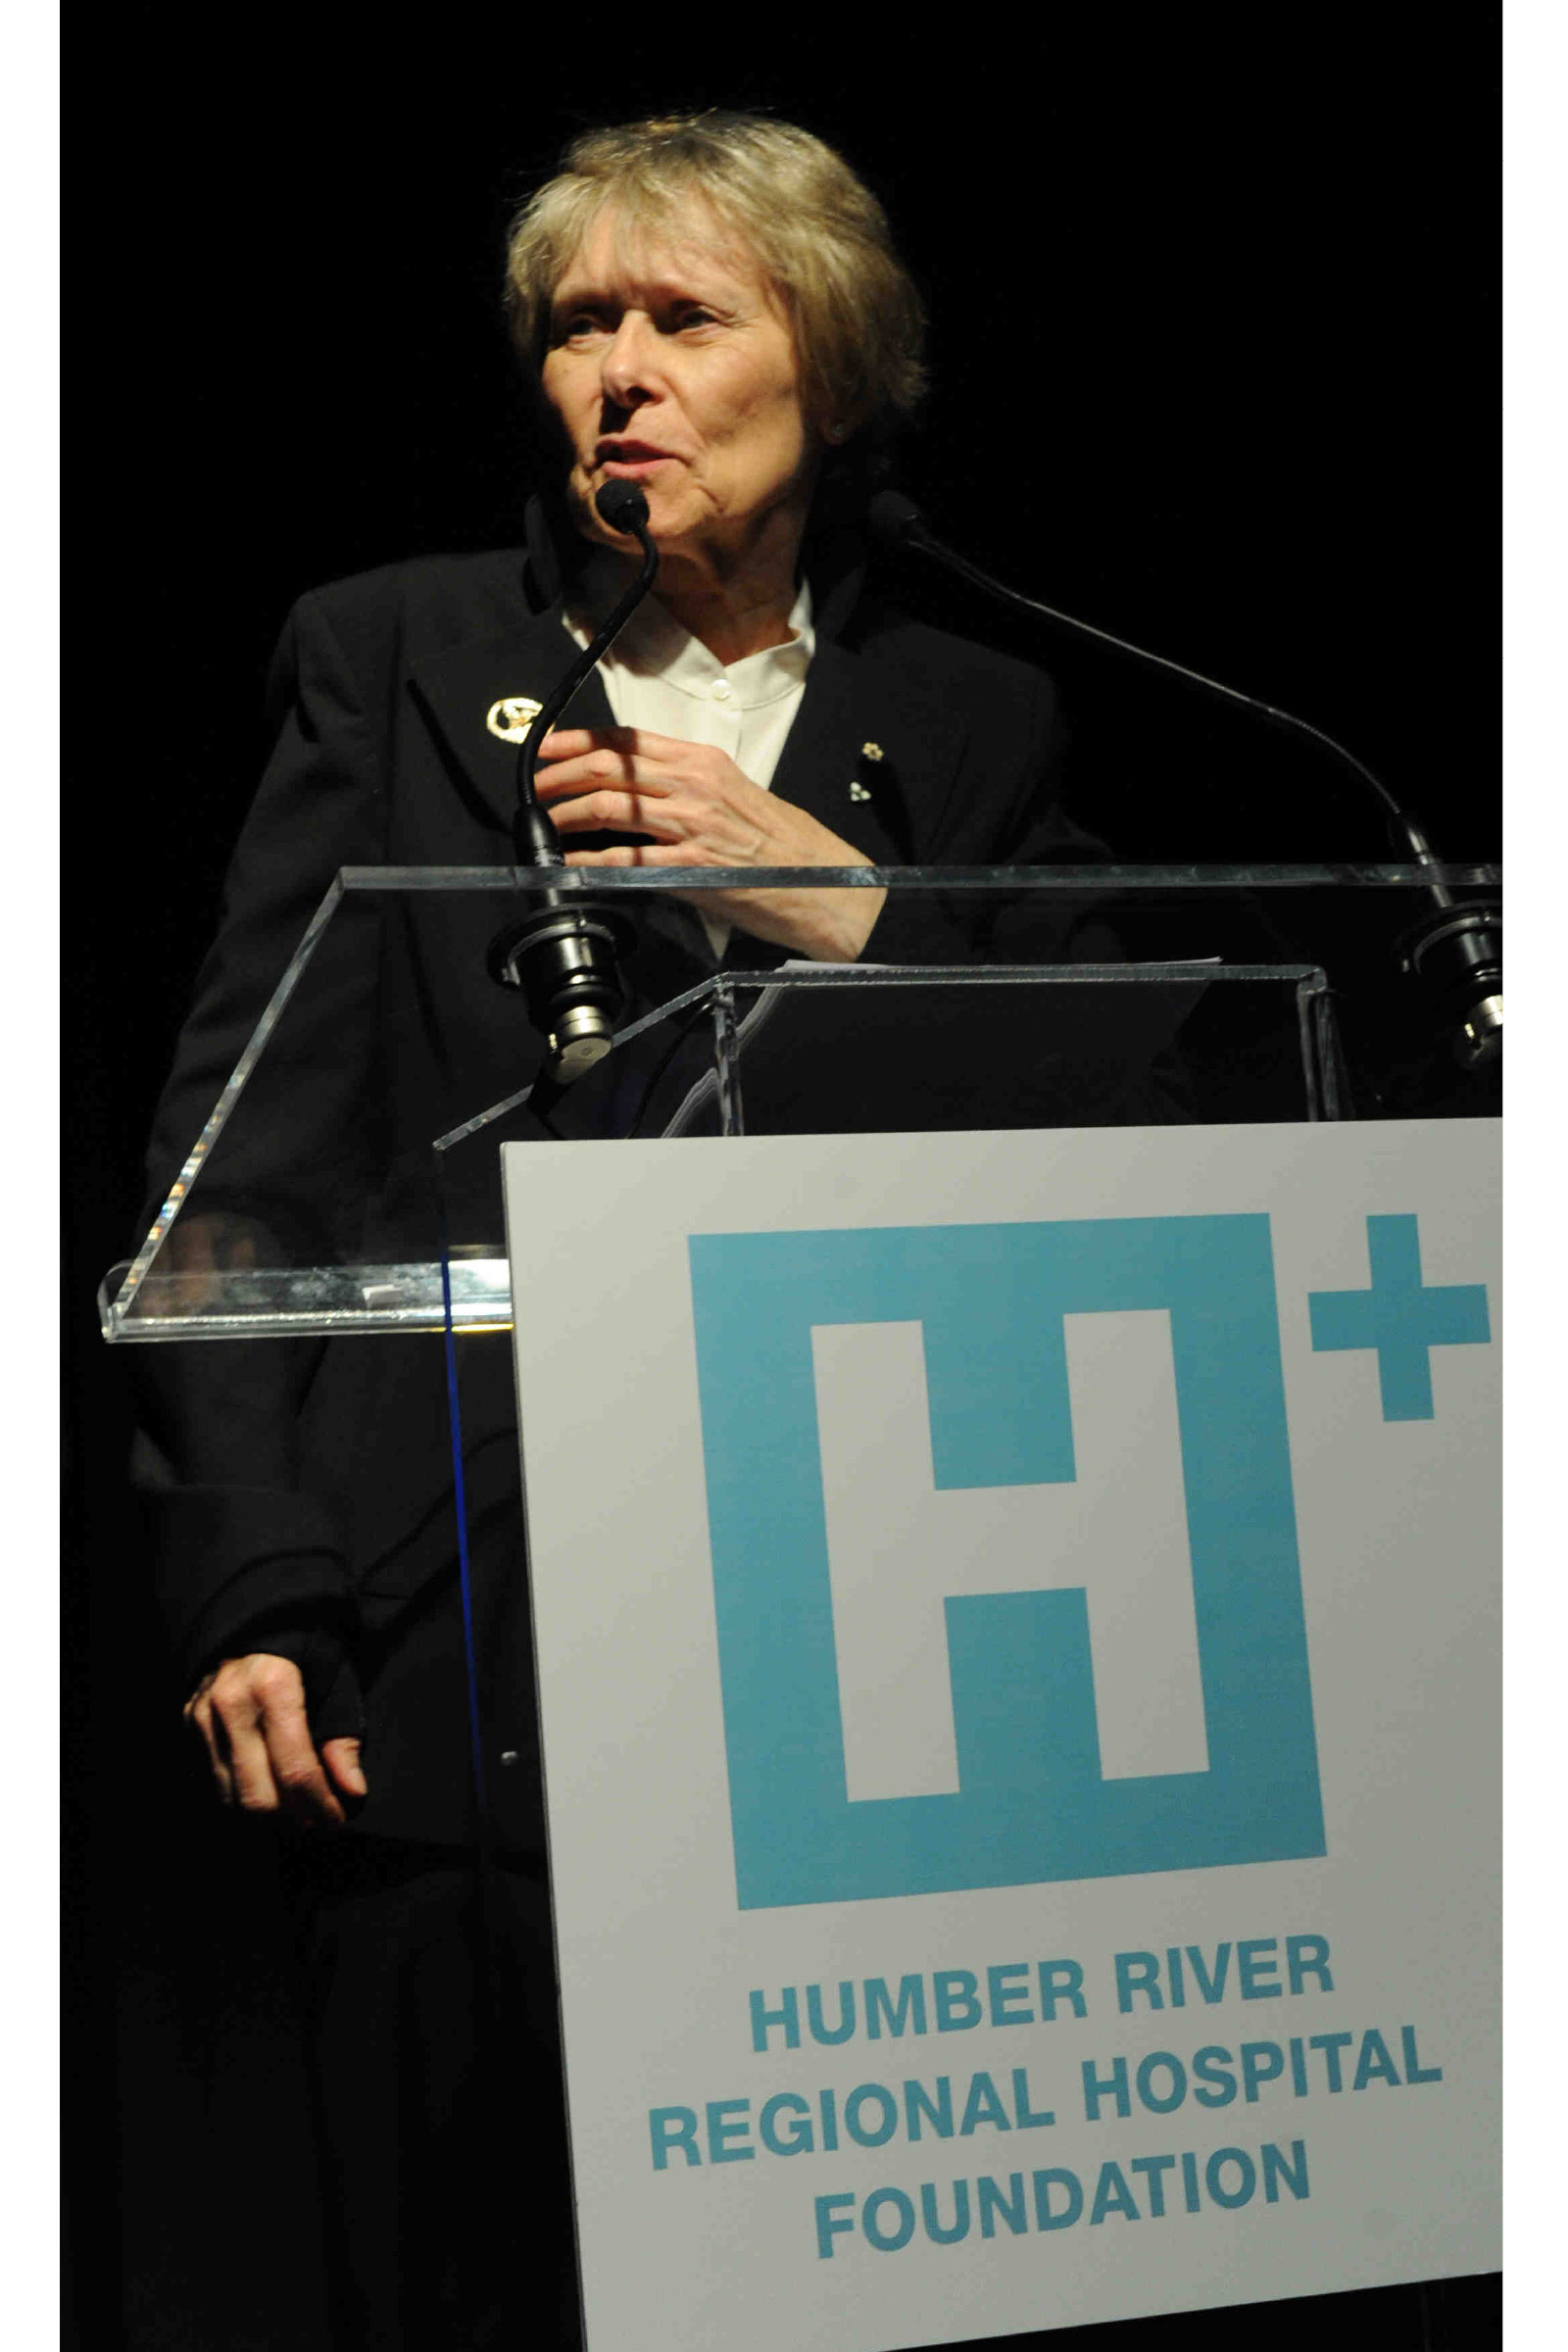 Roberta Bondar Accepting Award.JPG